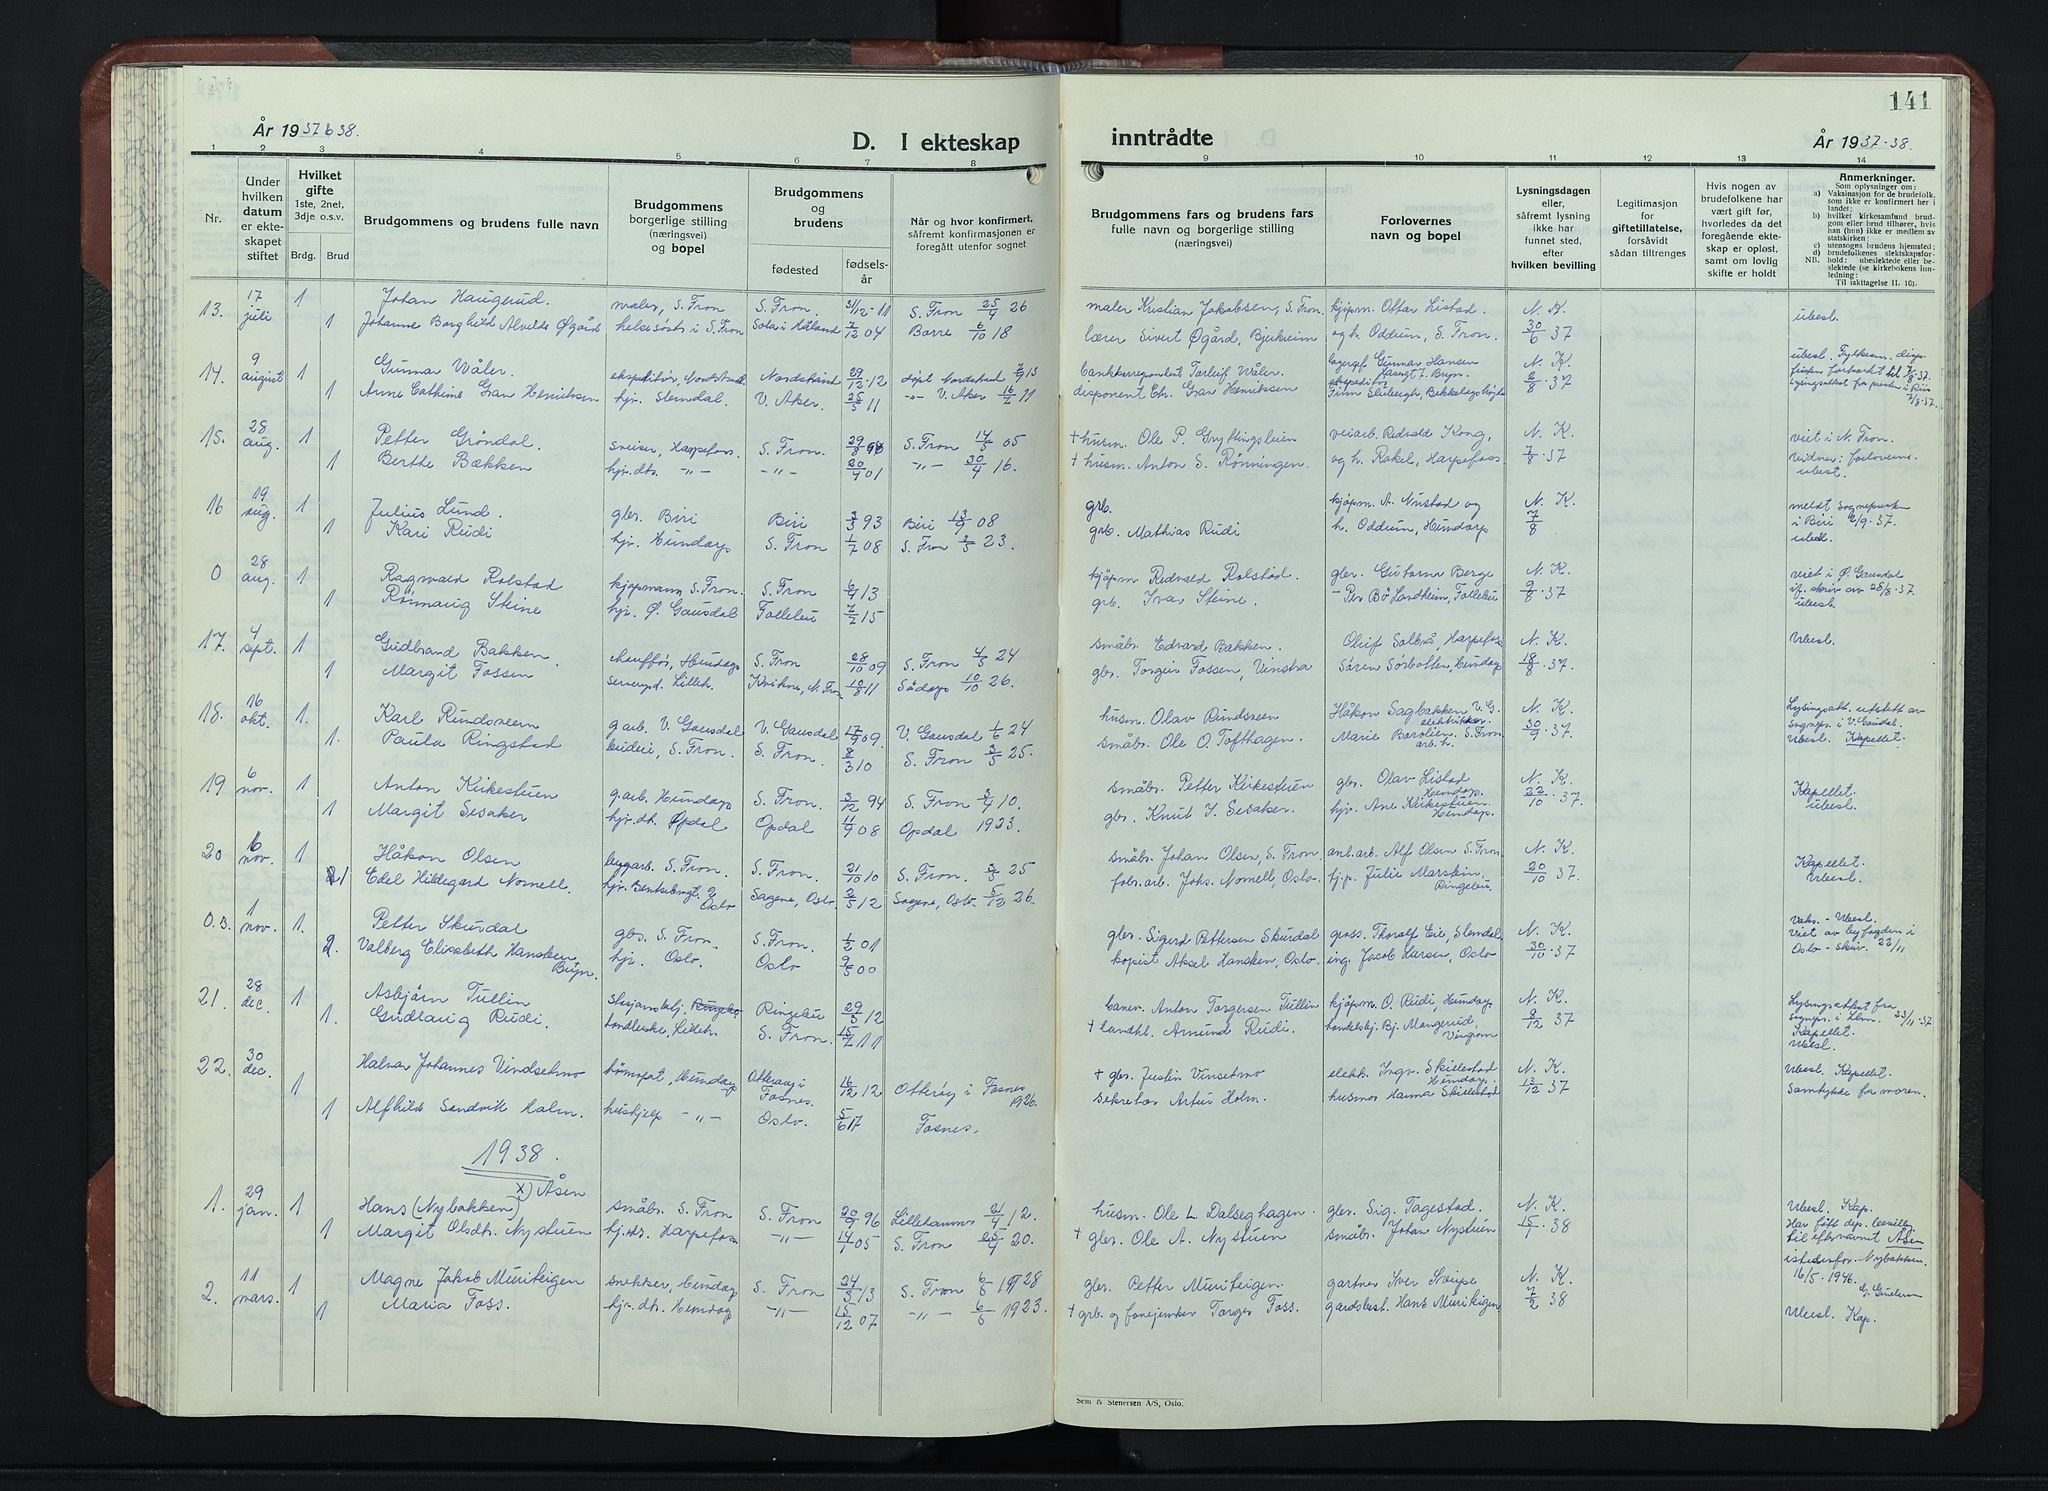 SAH, Sør-Fron prestekontor, H/Ha/Hab/L0006: Klokkerbok nr. 6, 1933-1948, s. 141